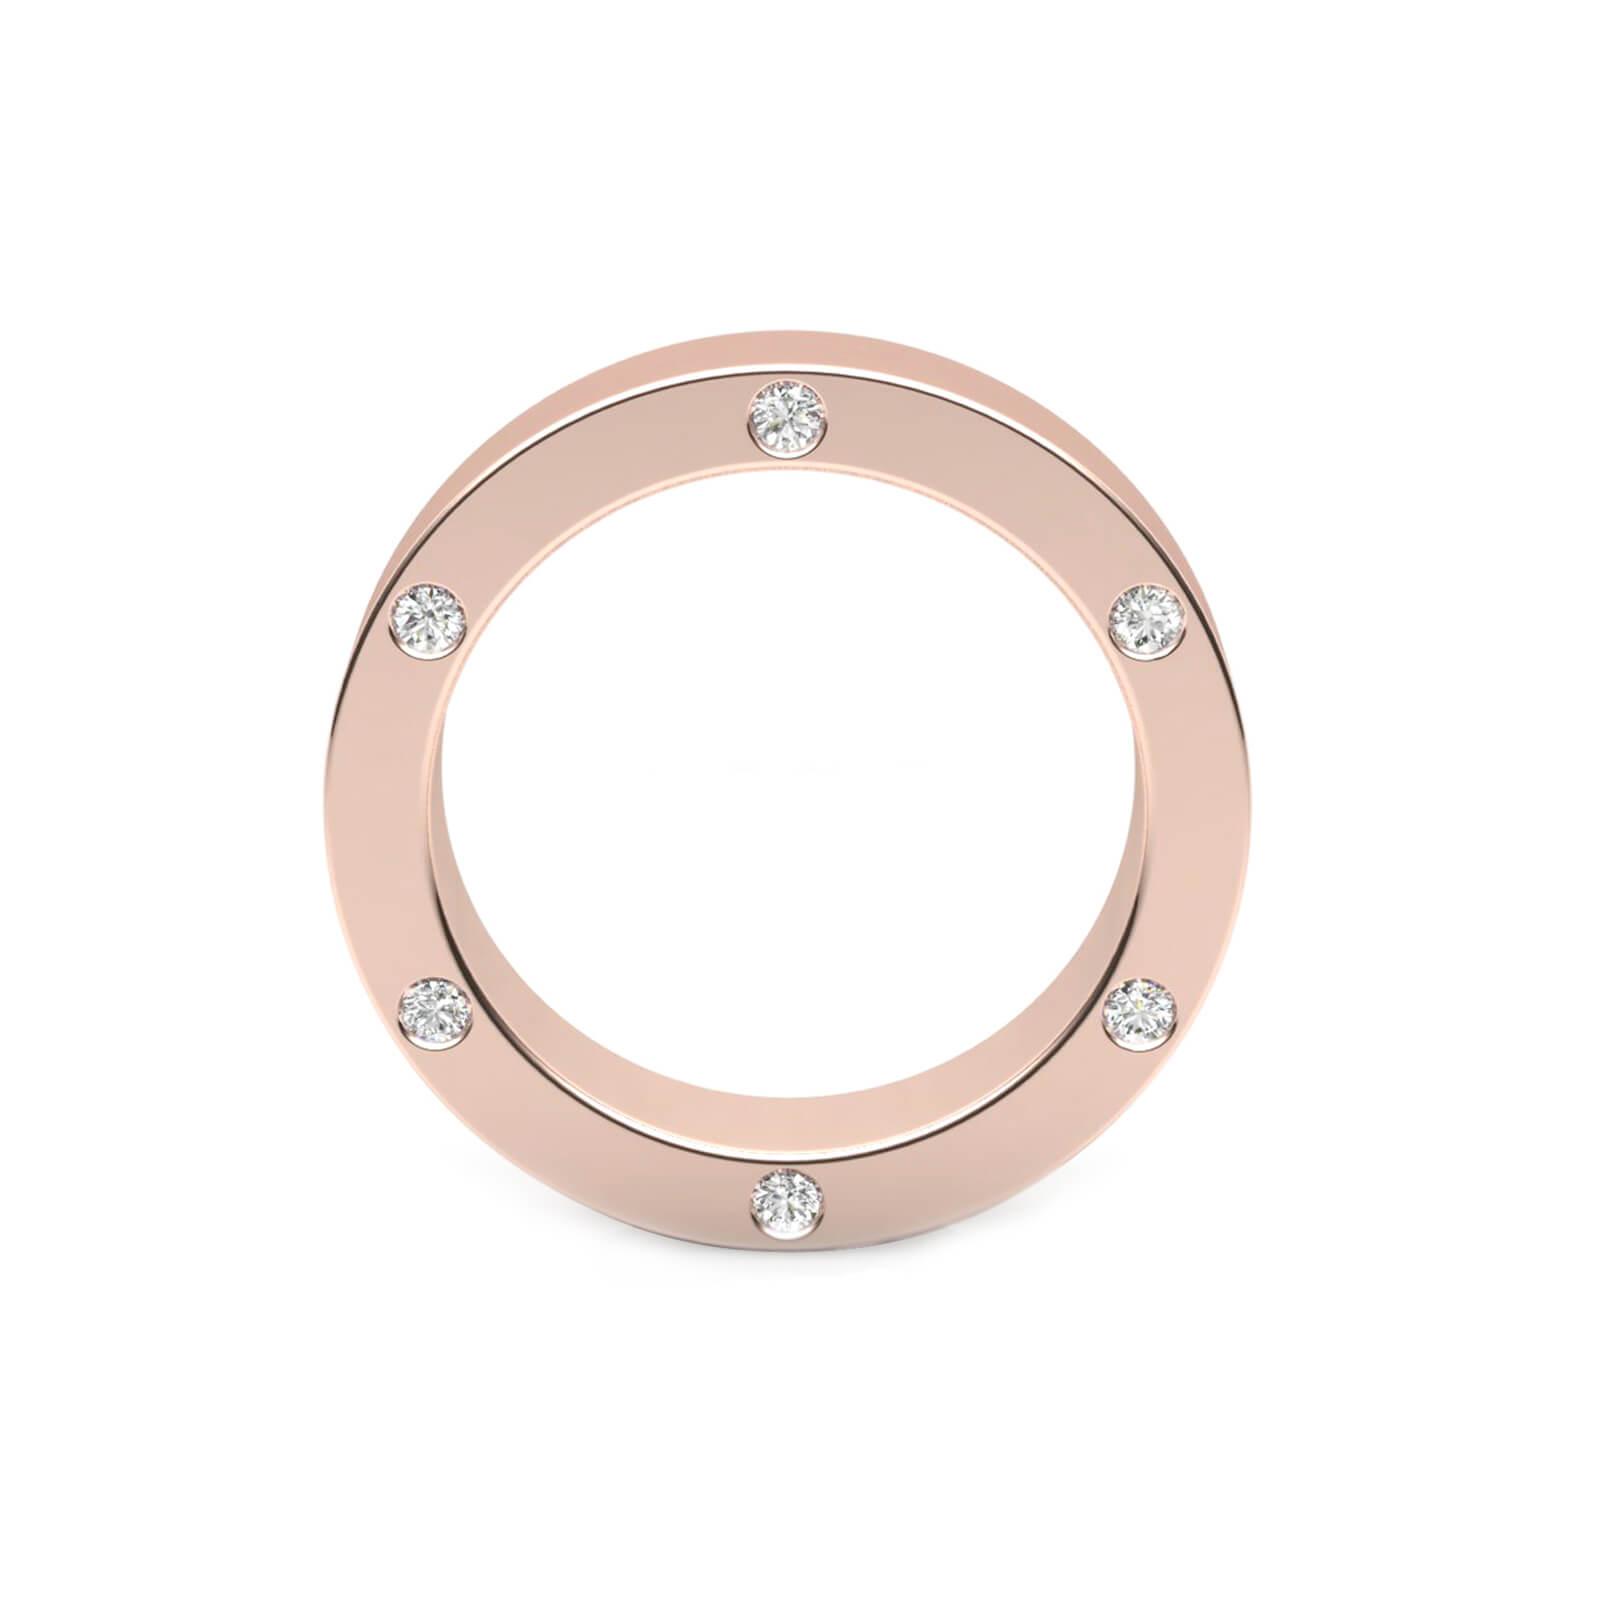 Wedding Ring 18k pink gold with 6 brilliant cut diamond